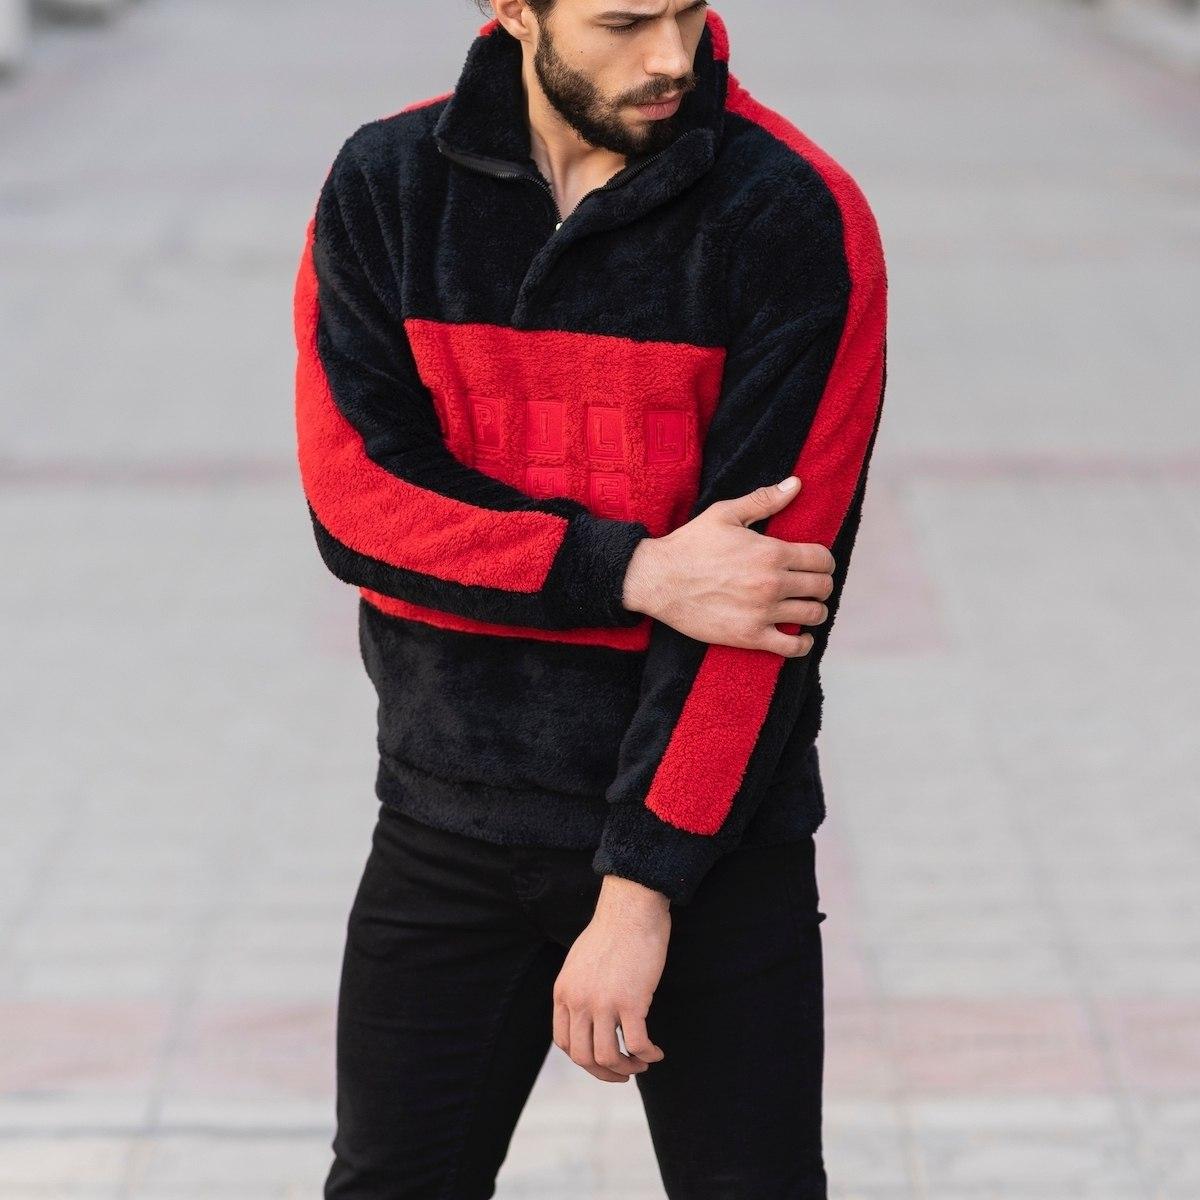 Well-Soft SweatShirt in Black&Red Mv Premium Brand - 4